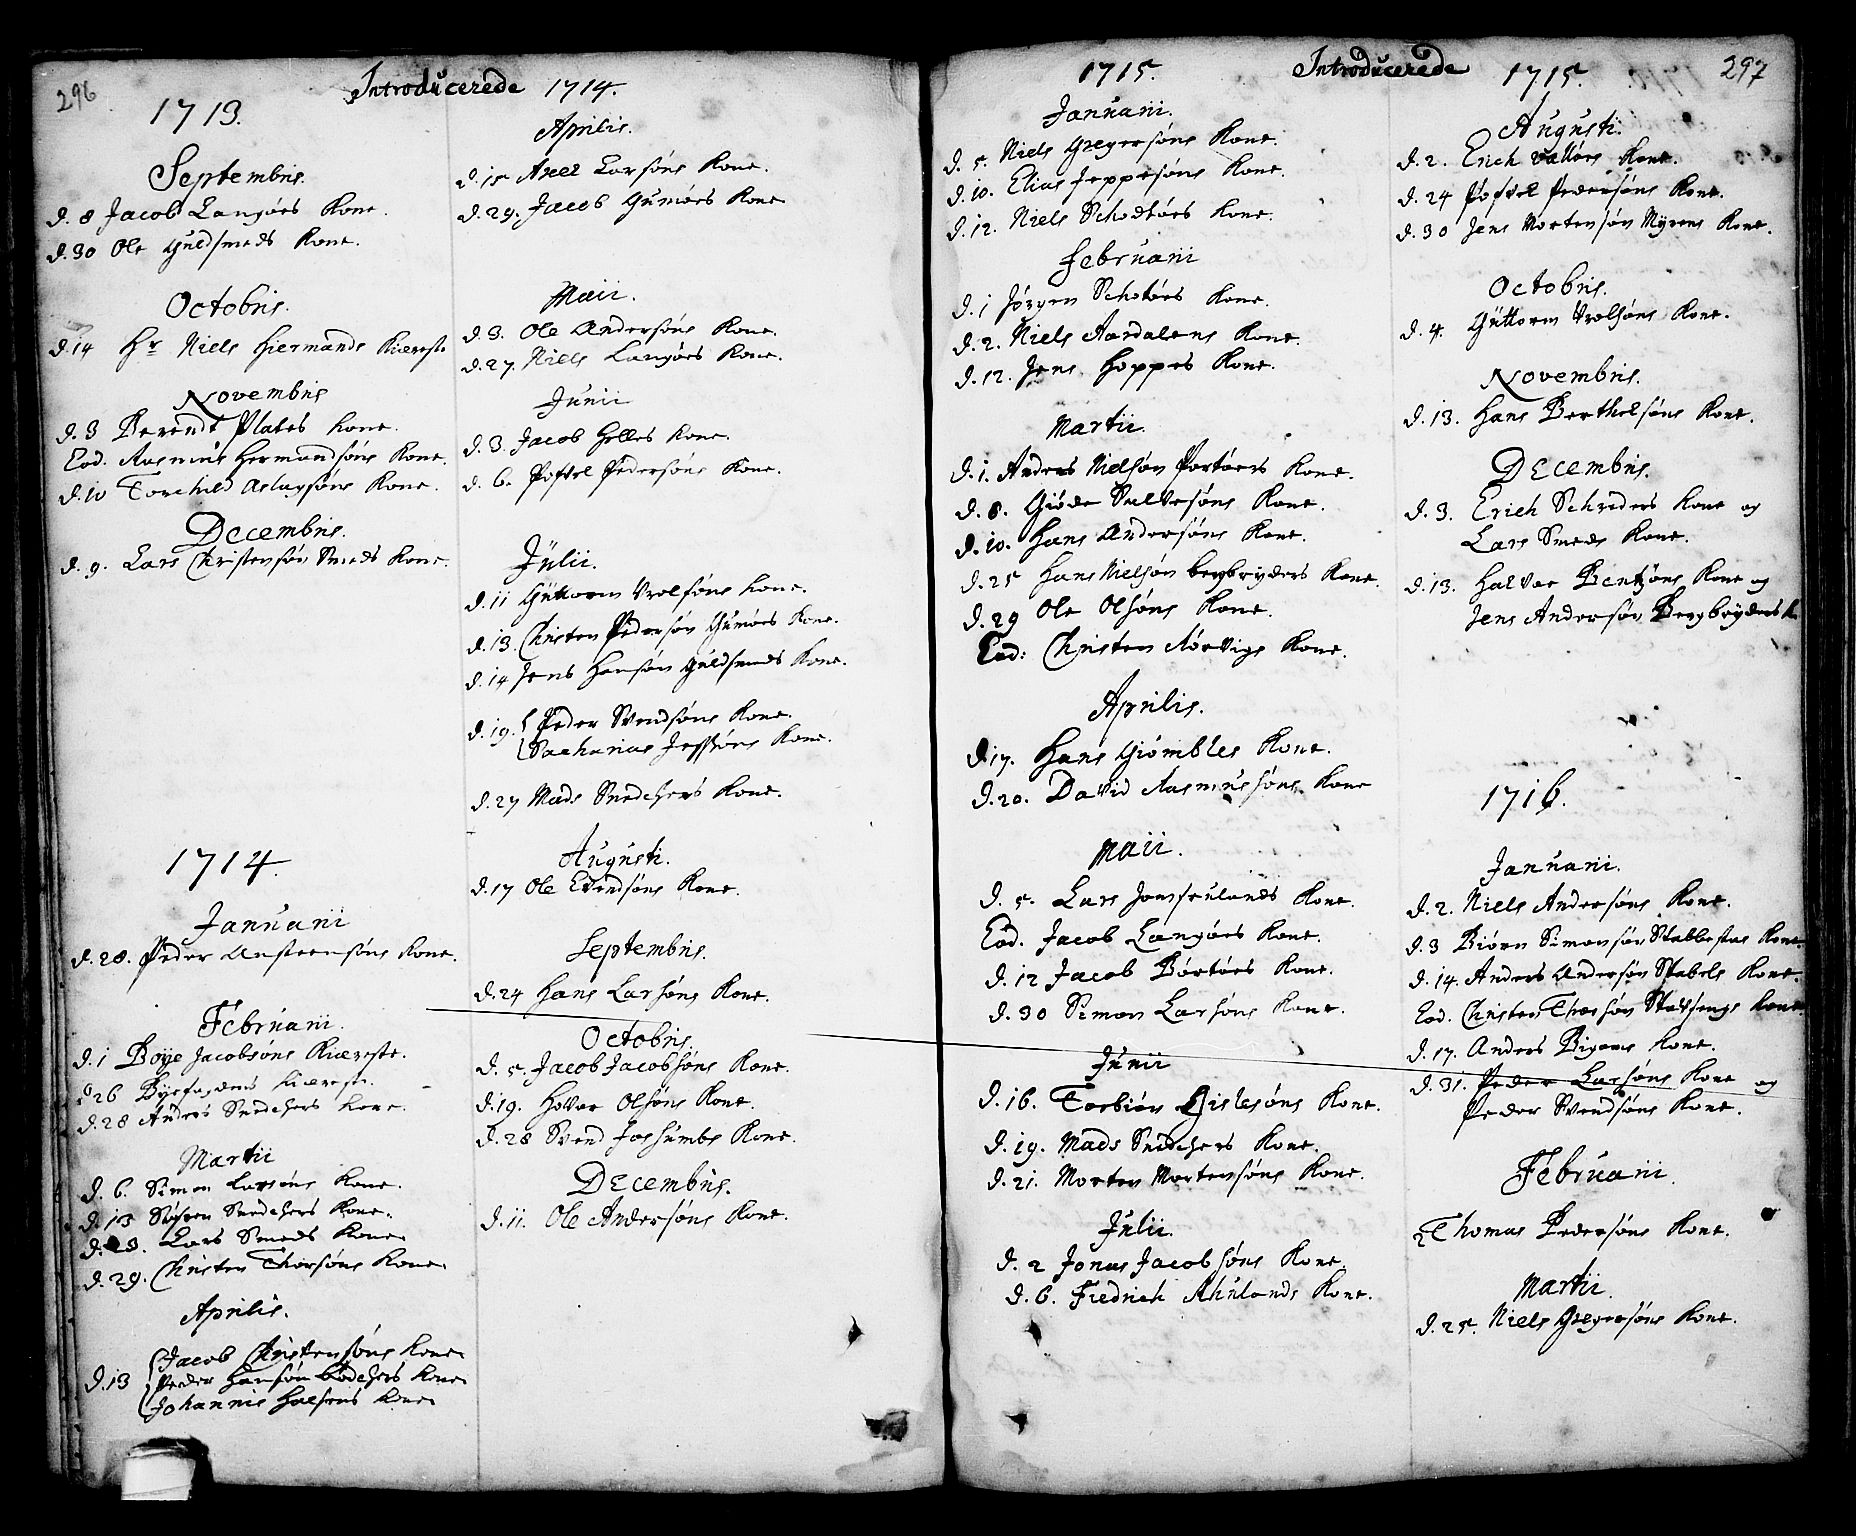 SAKO, Kragerø kirkebøker, F/Fa/L0001: Ministerialbok nr. 1, 1702-1766, s. 296-297